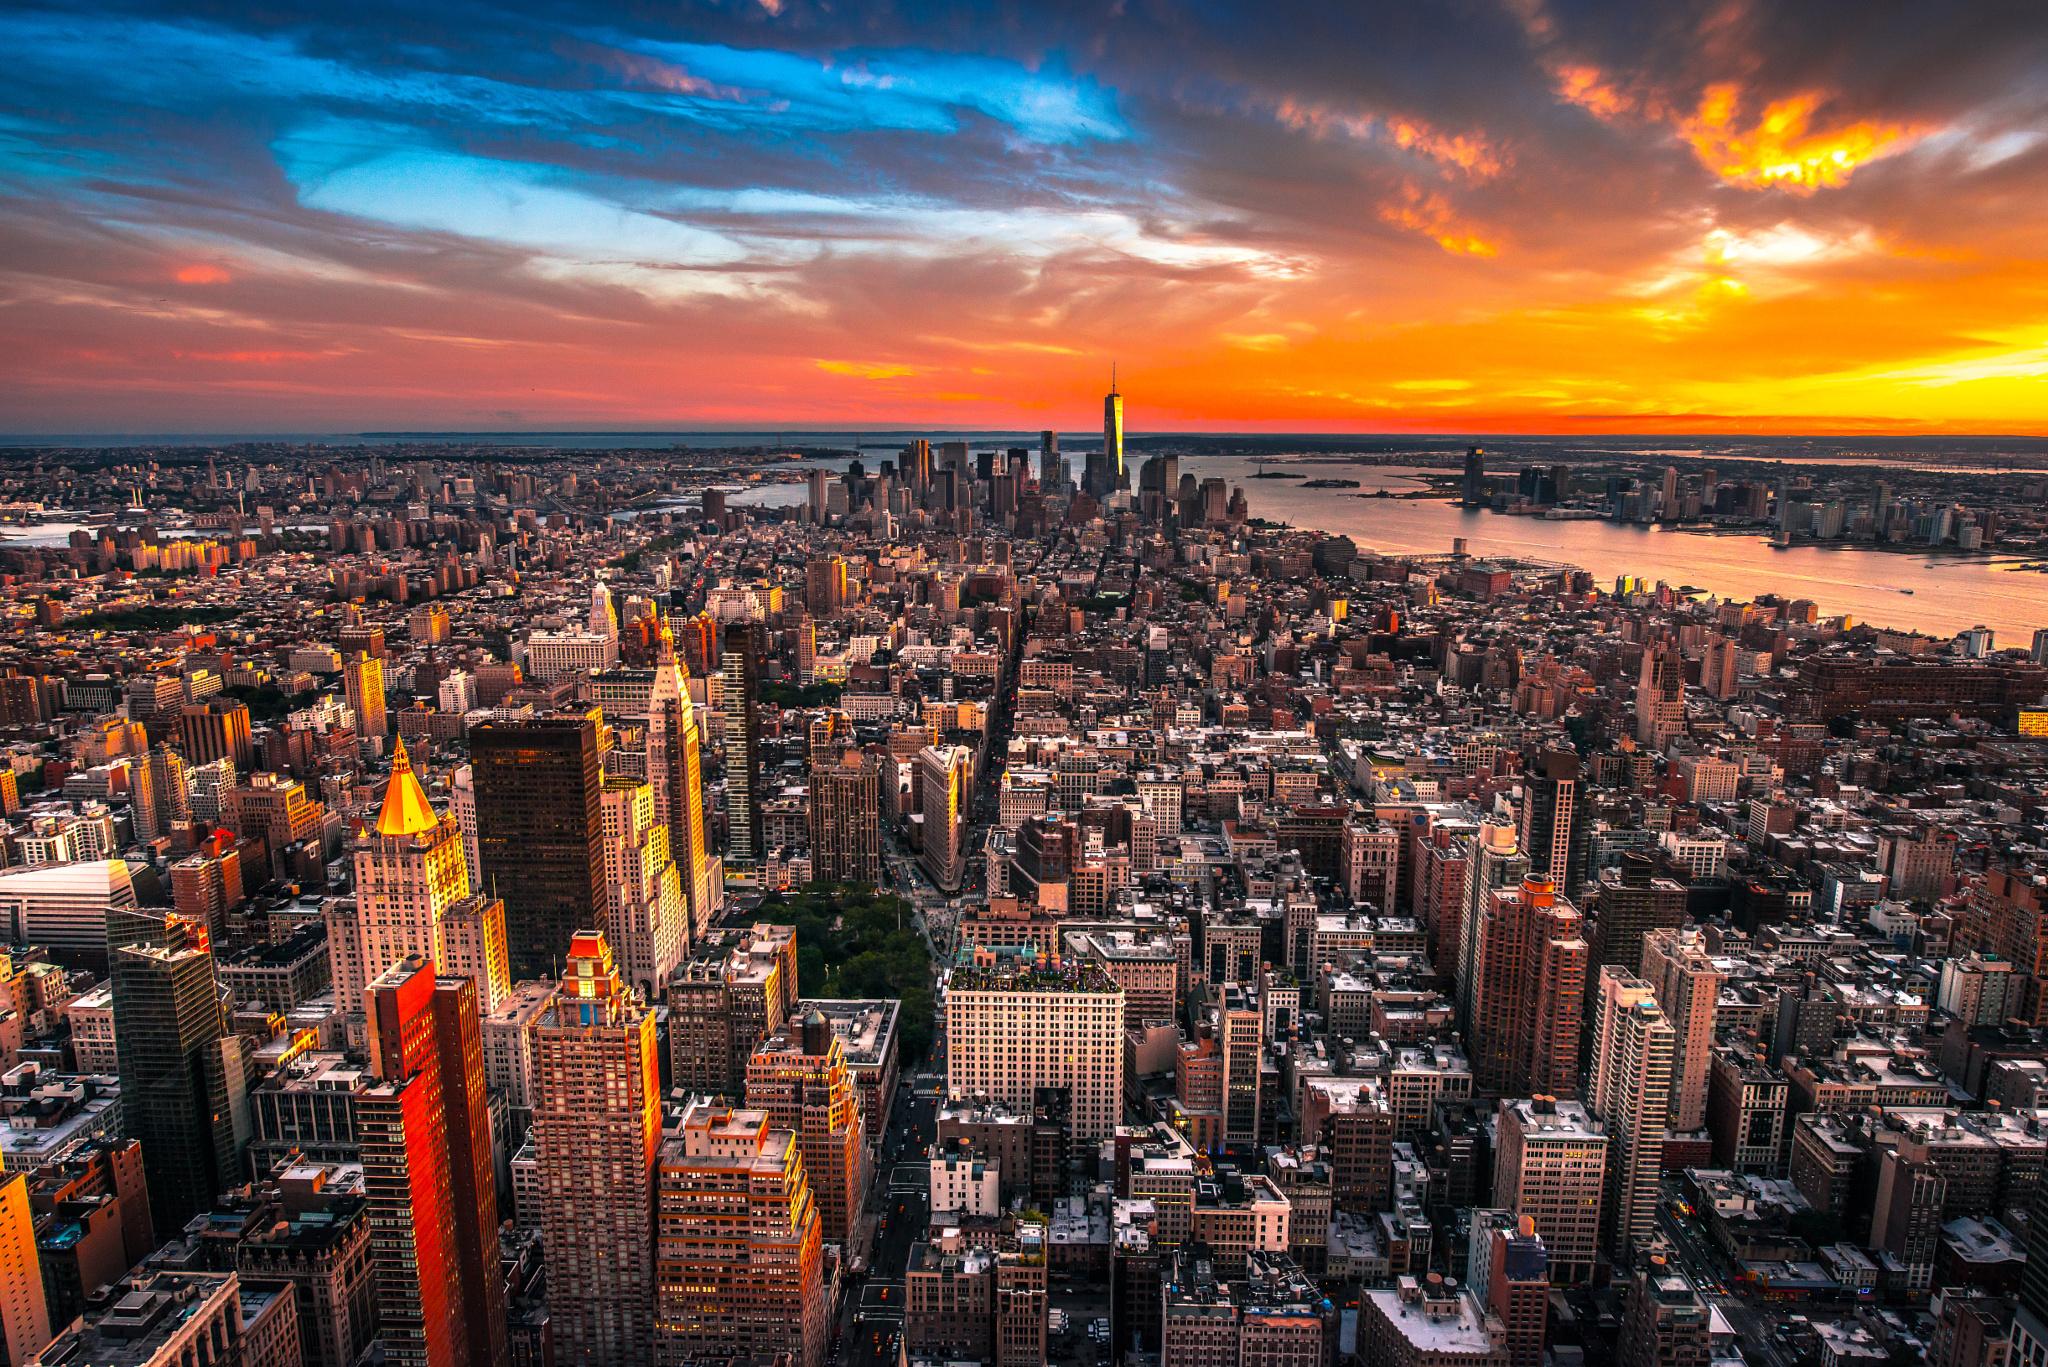 New york hd wallpaper background image 2048x1367 id for Sfondi 4k per pc